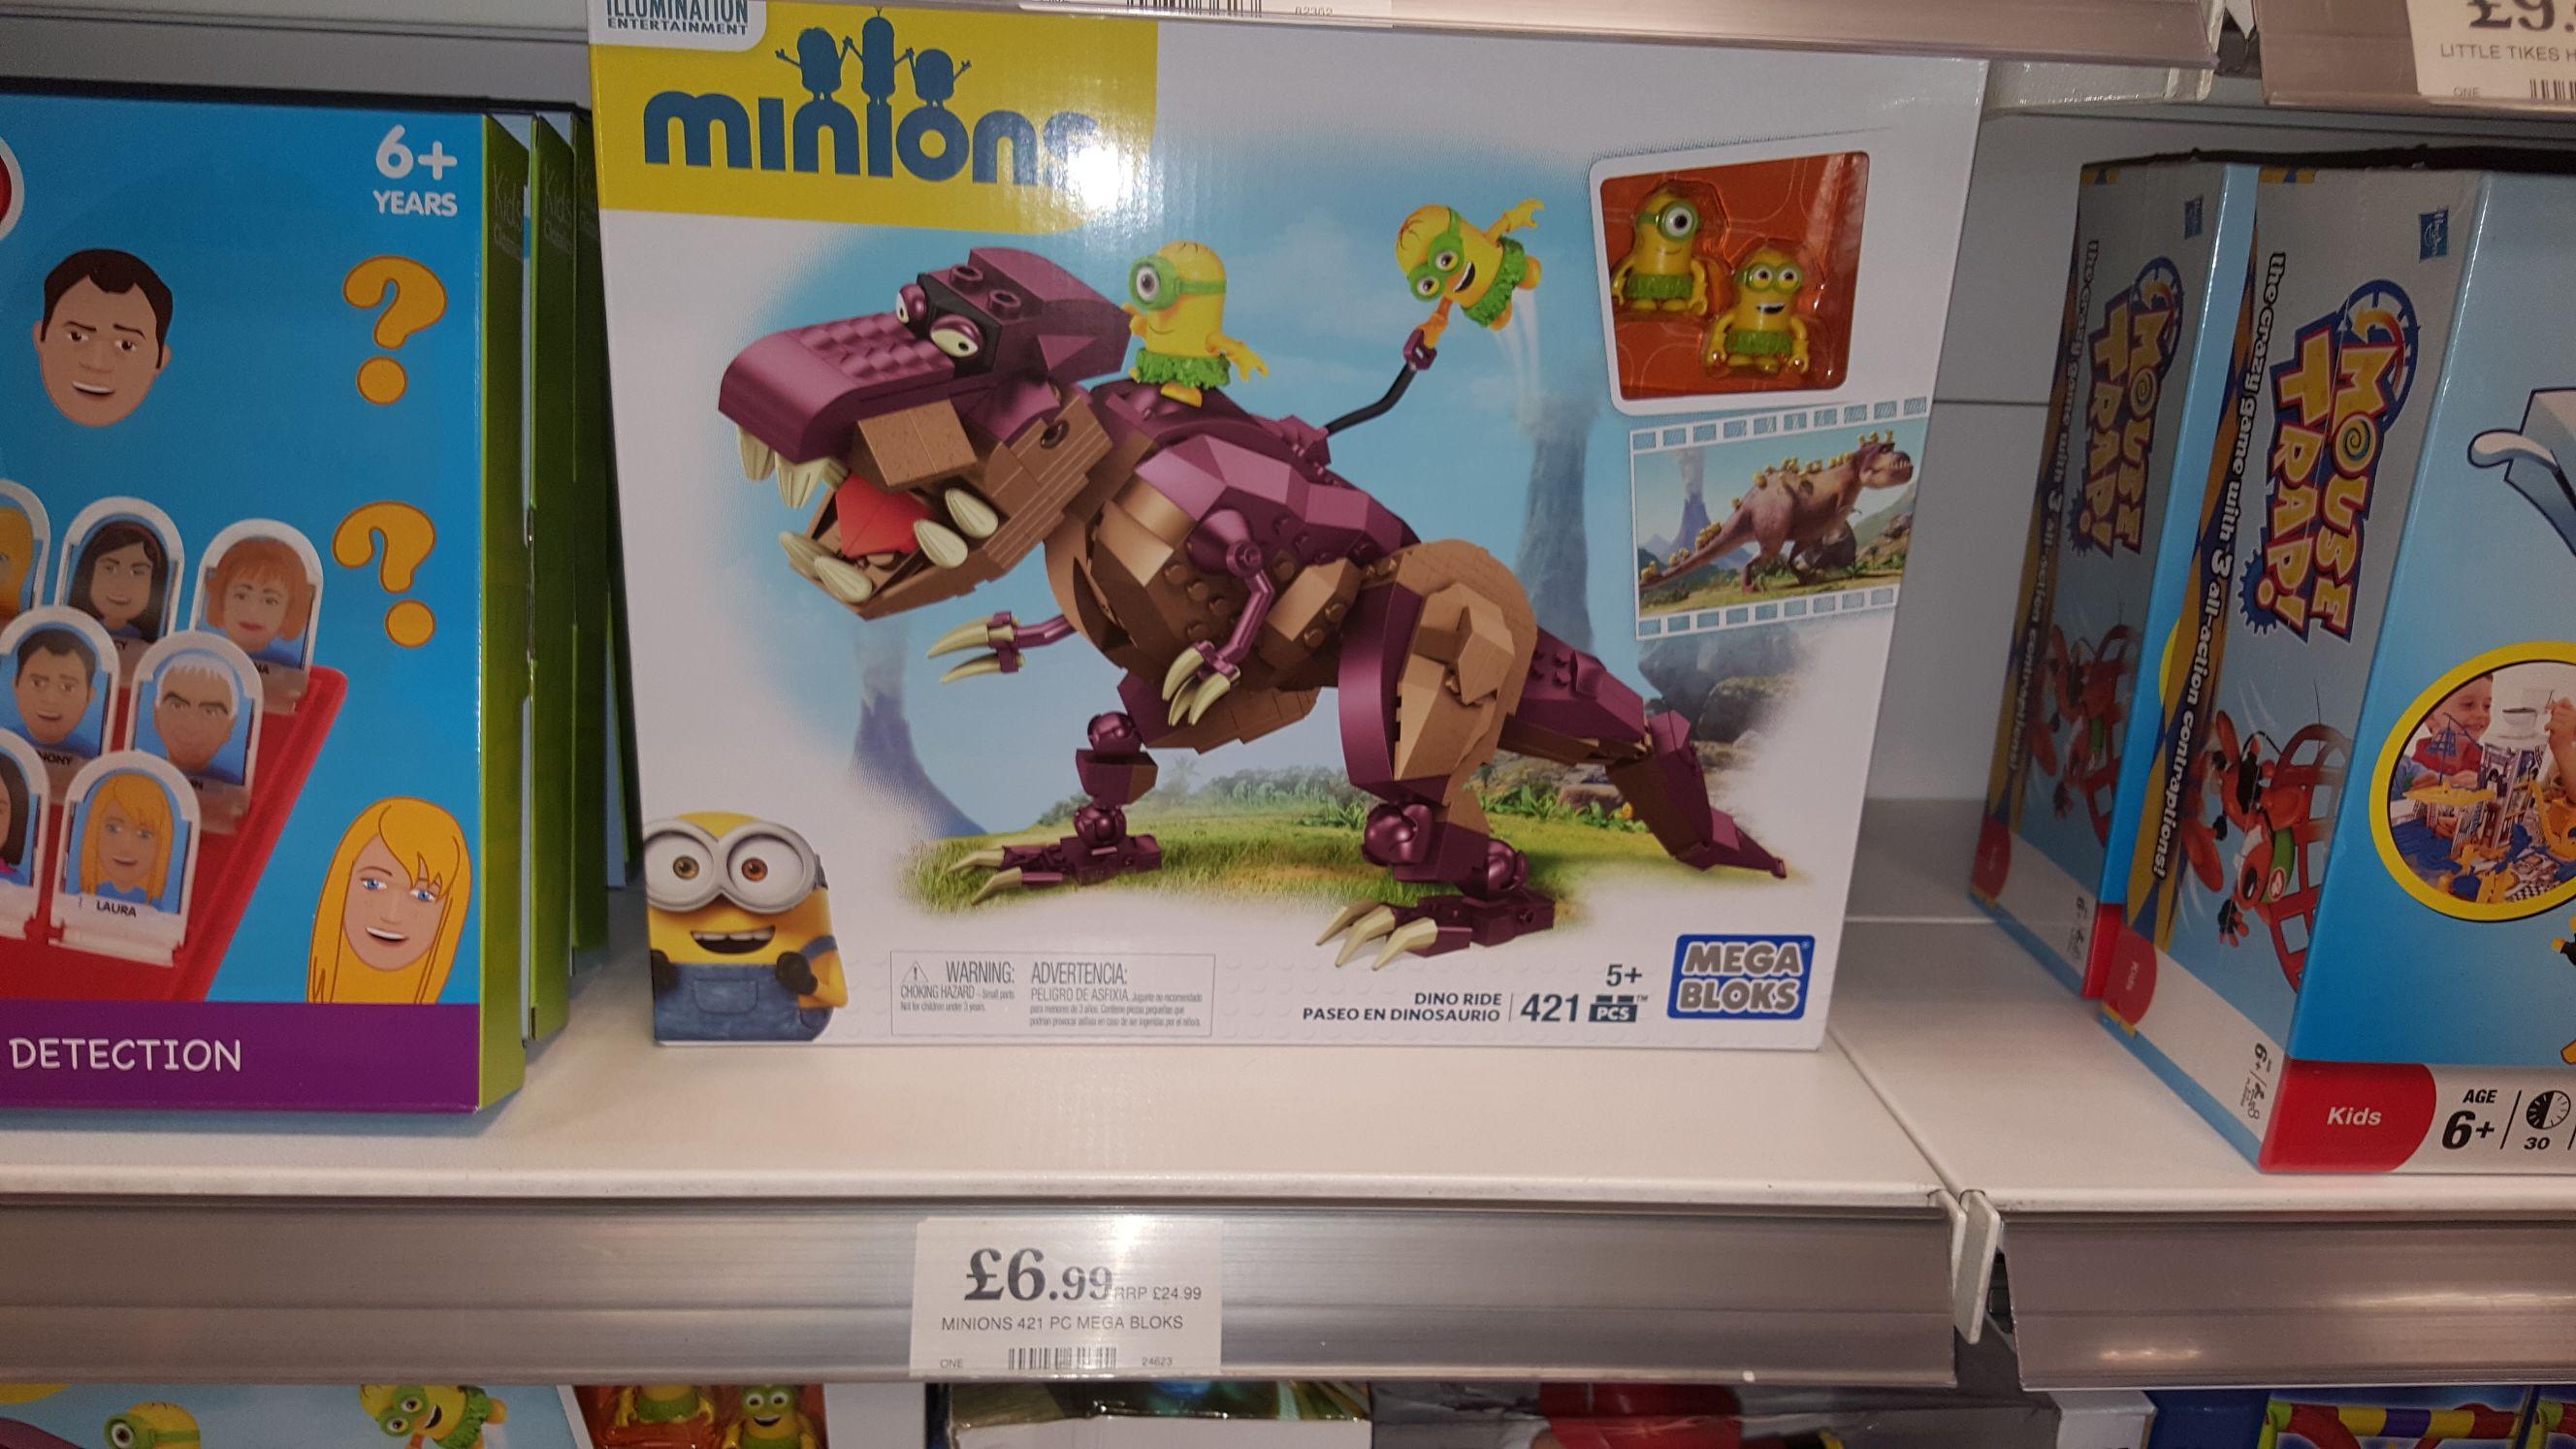 Despicable Me 2 - Minions Mega Bloks DINOSAUR RIDE 421 pieces at Home Bargains